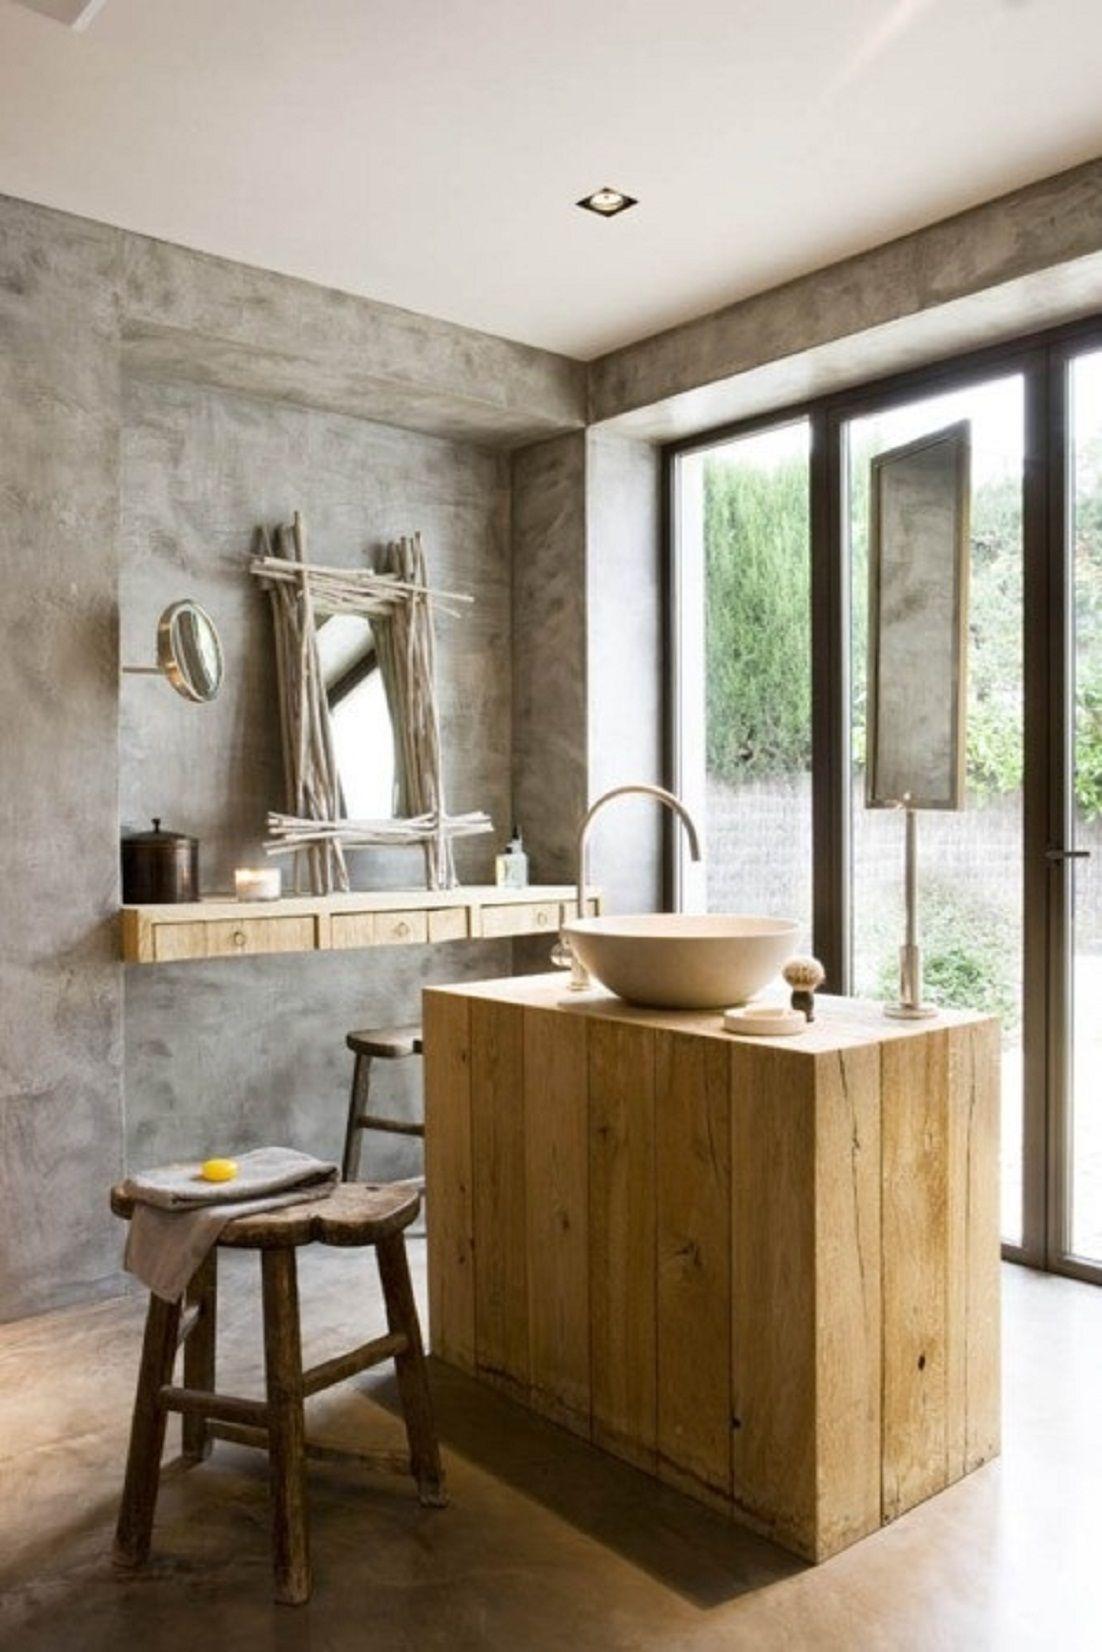 cool rustic bathroom design ideas modern concrete walls and chairs - Rustic Bathroom Design